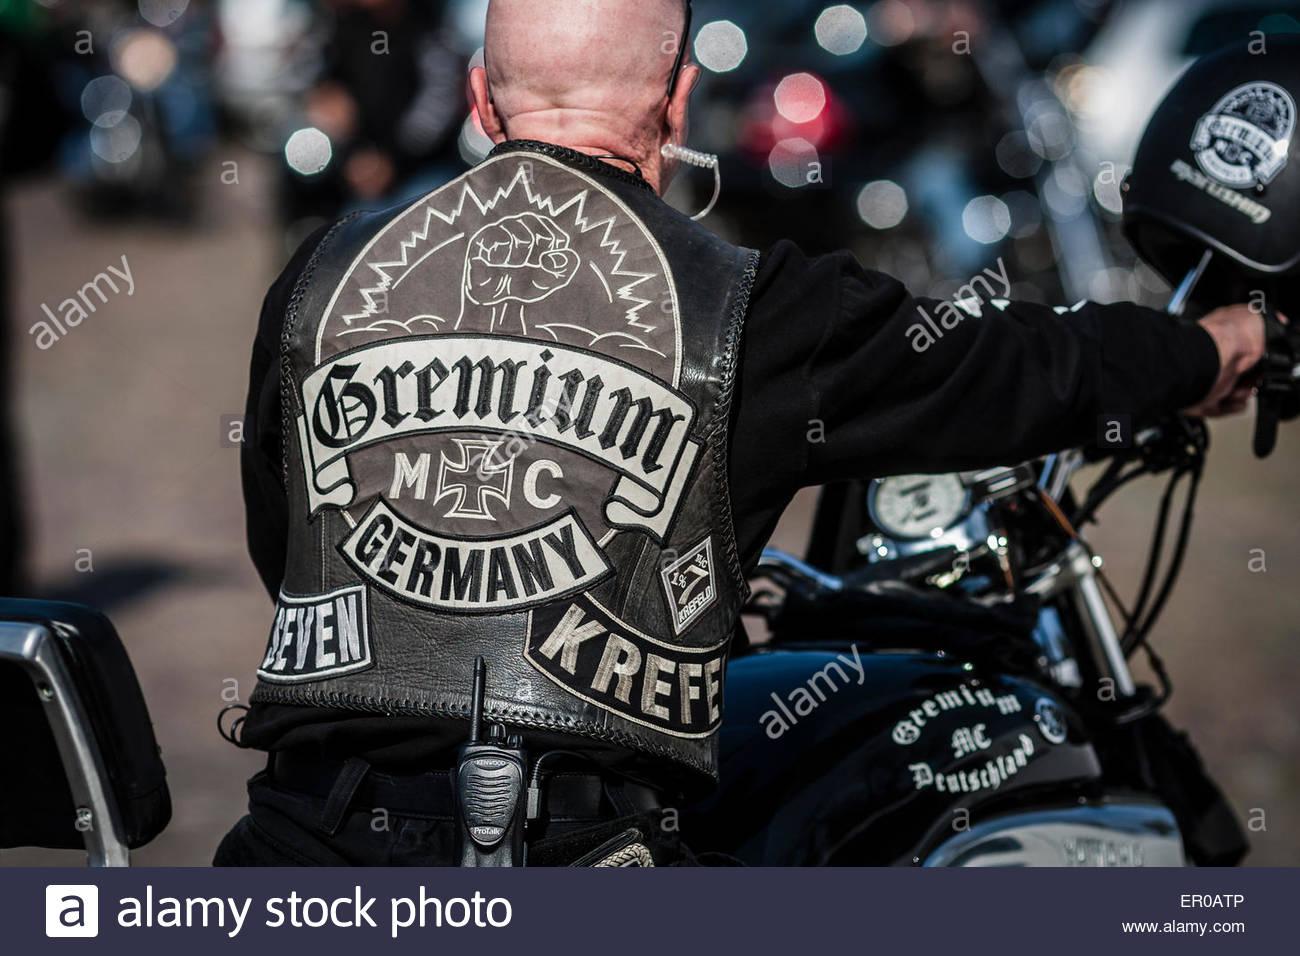 biker from Gremium MC, Krefeld Germany - Stock Image